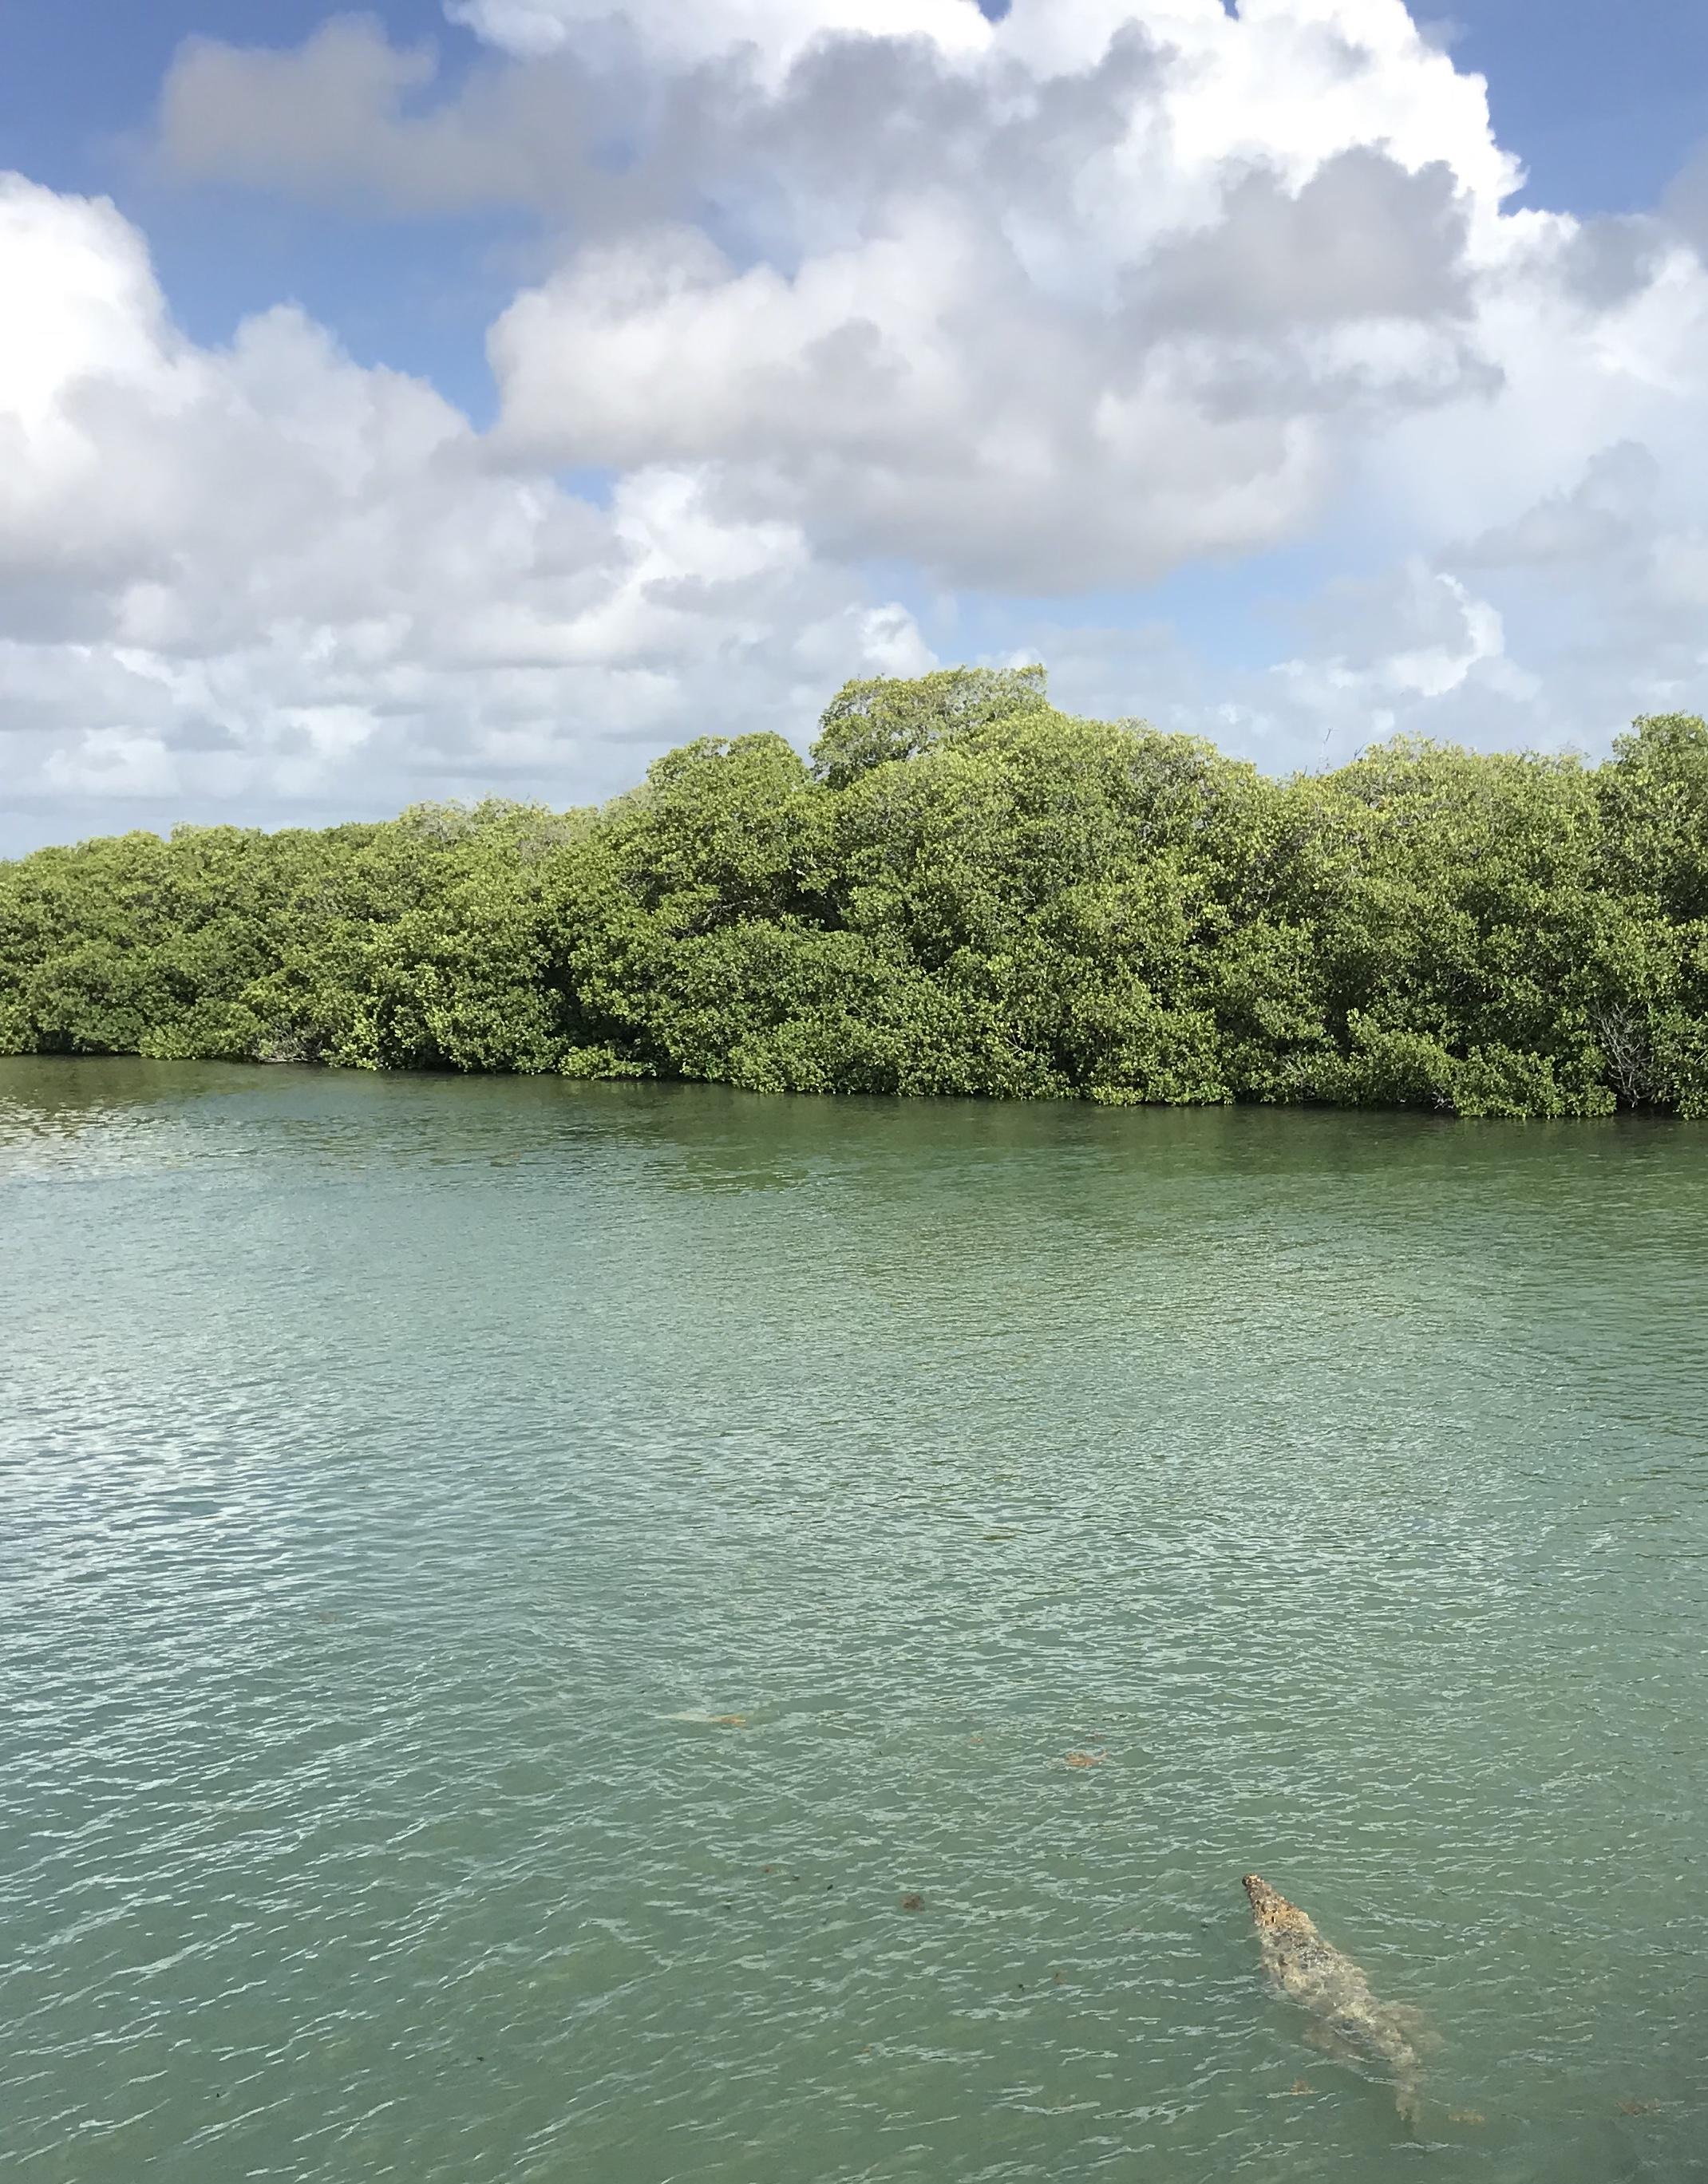 coccodrillo-riserva-sian-kaan-quintana-roo-messico